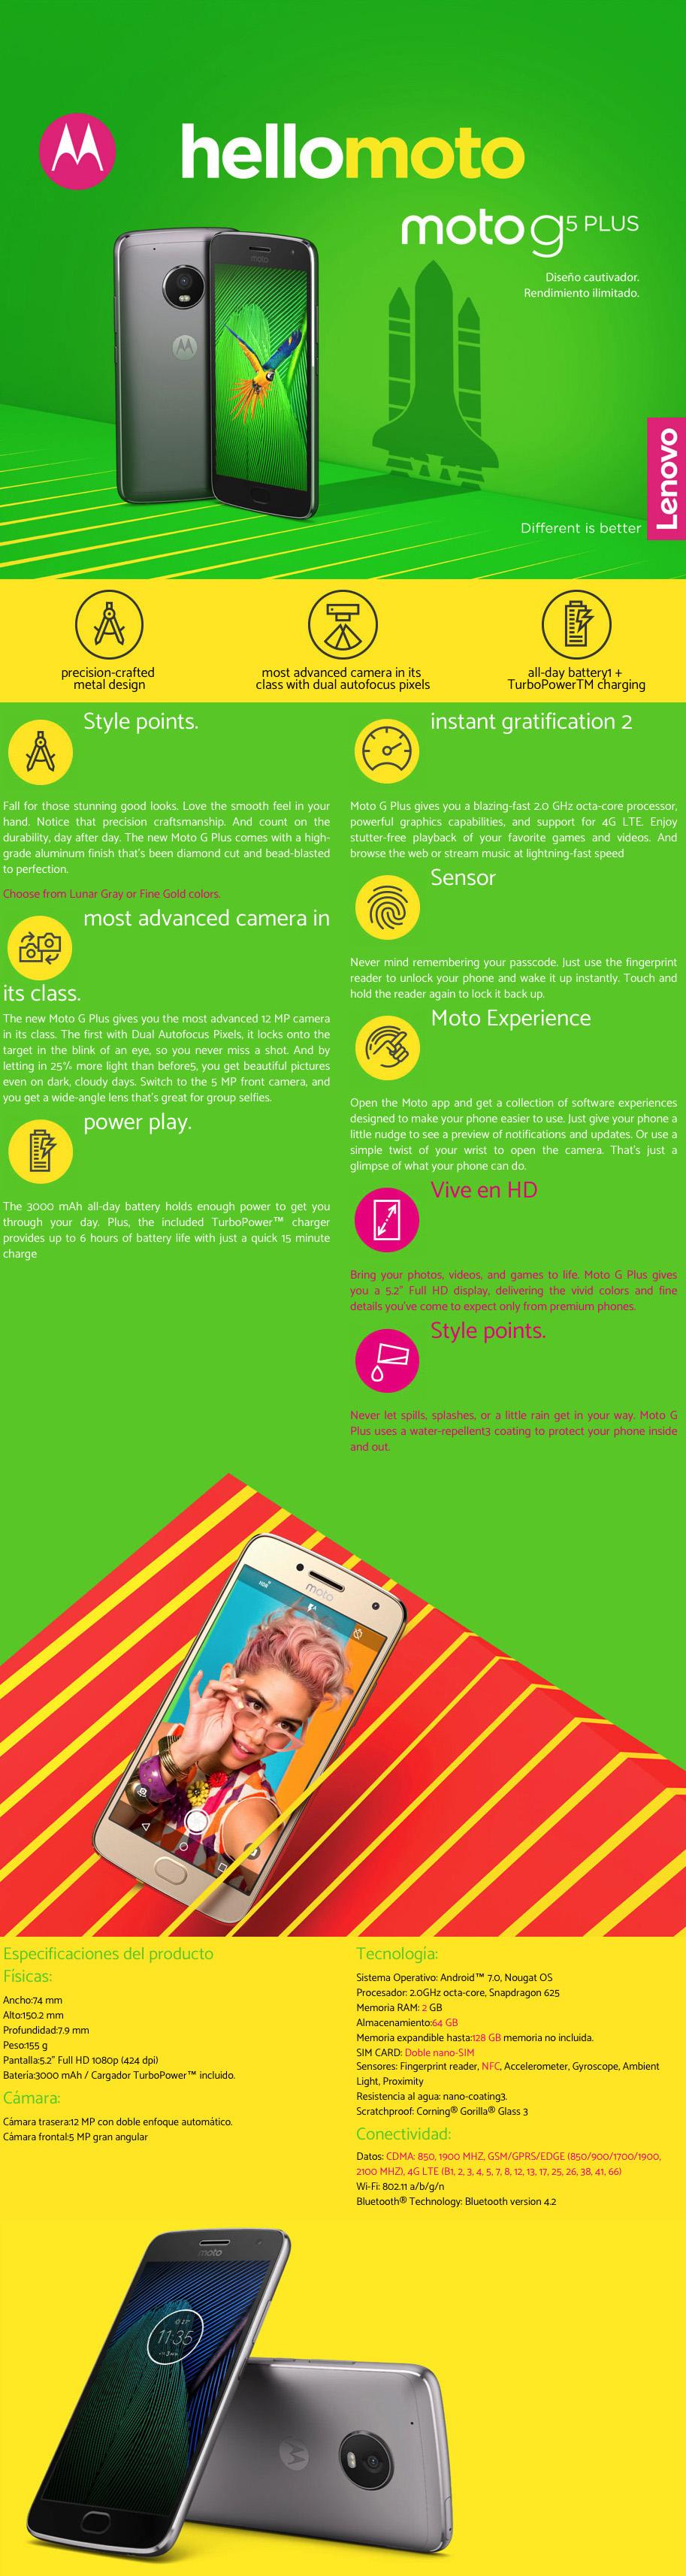 Moto G5 Plus Poster